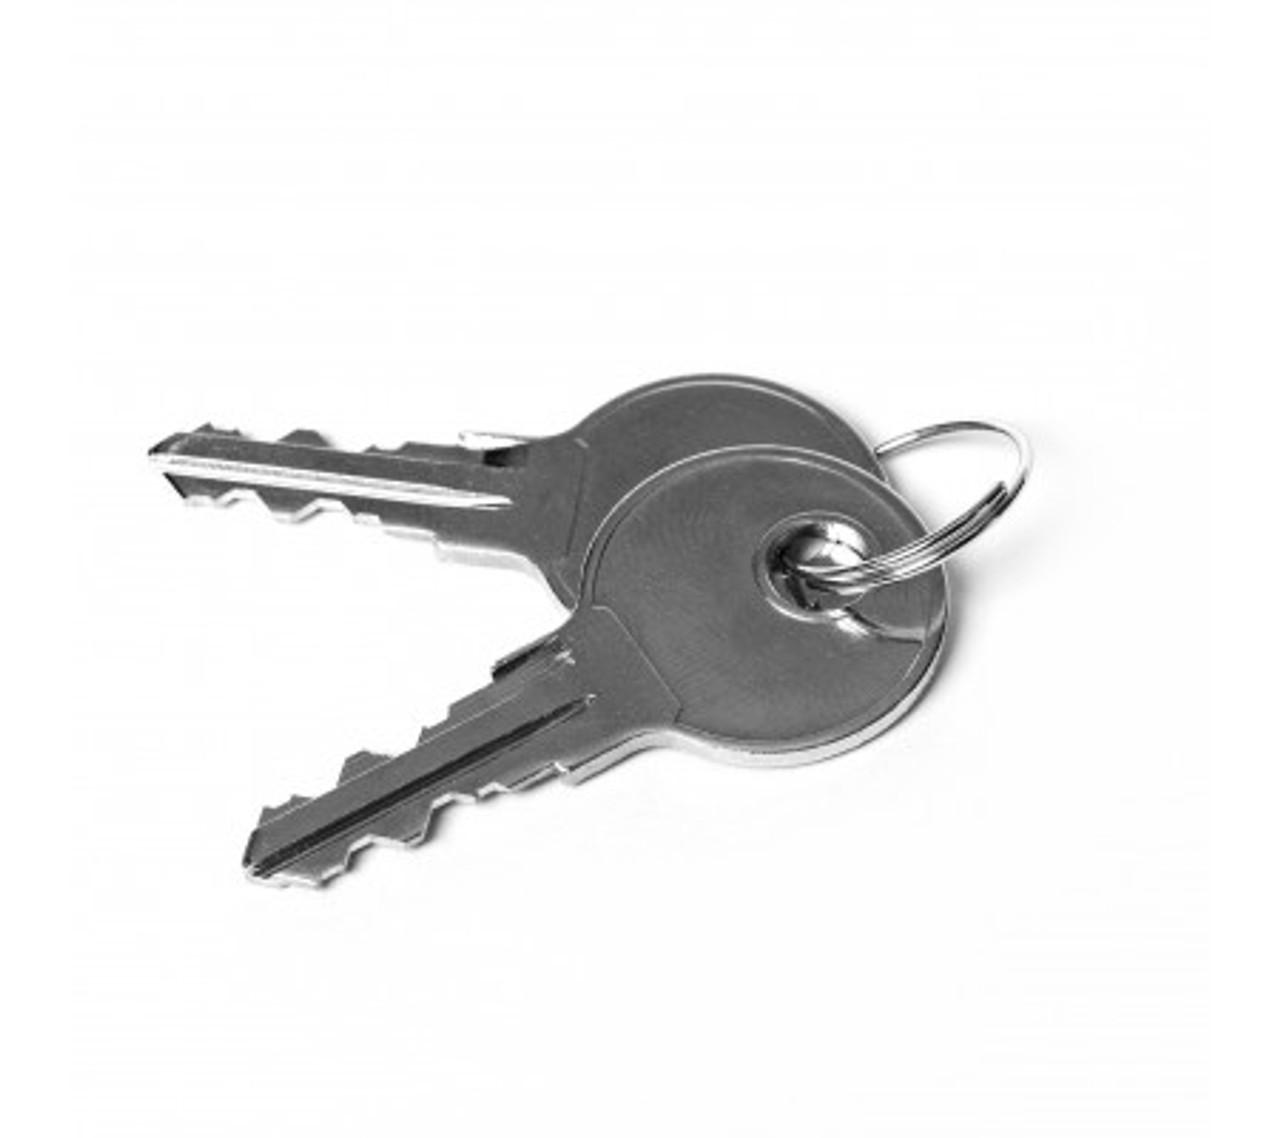 Includes Keys